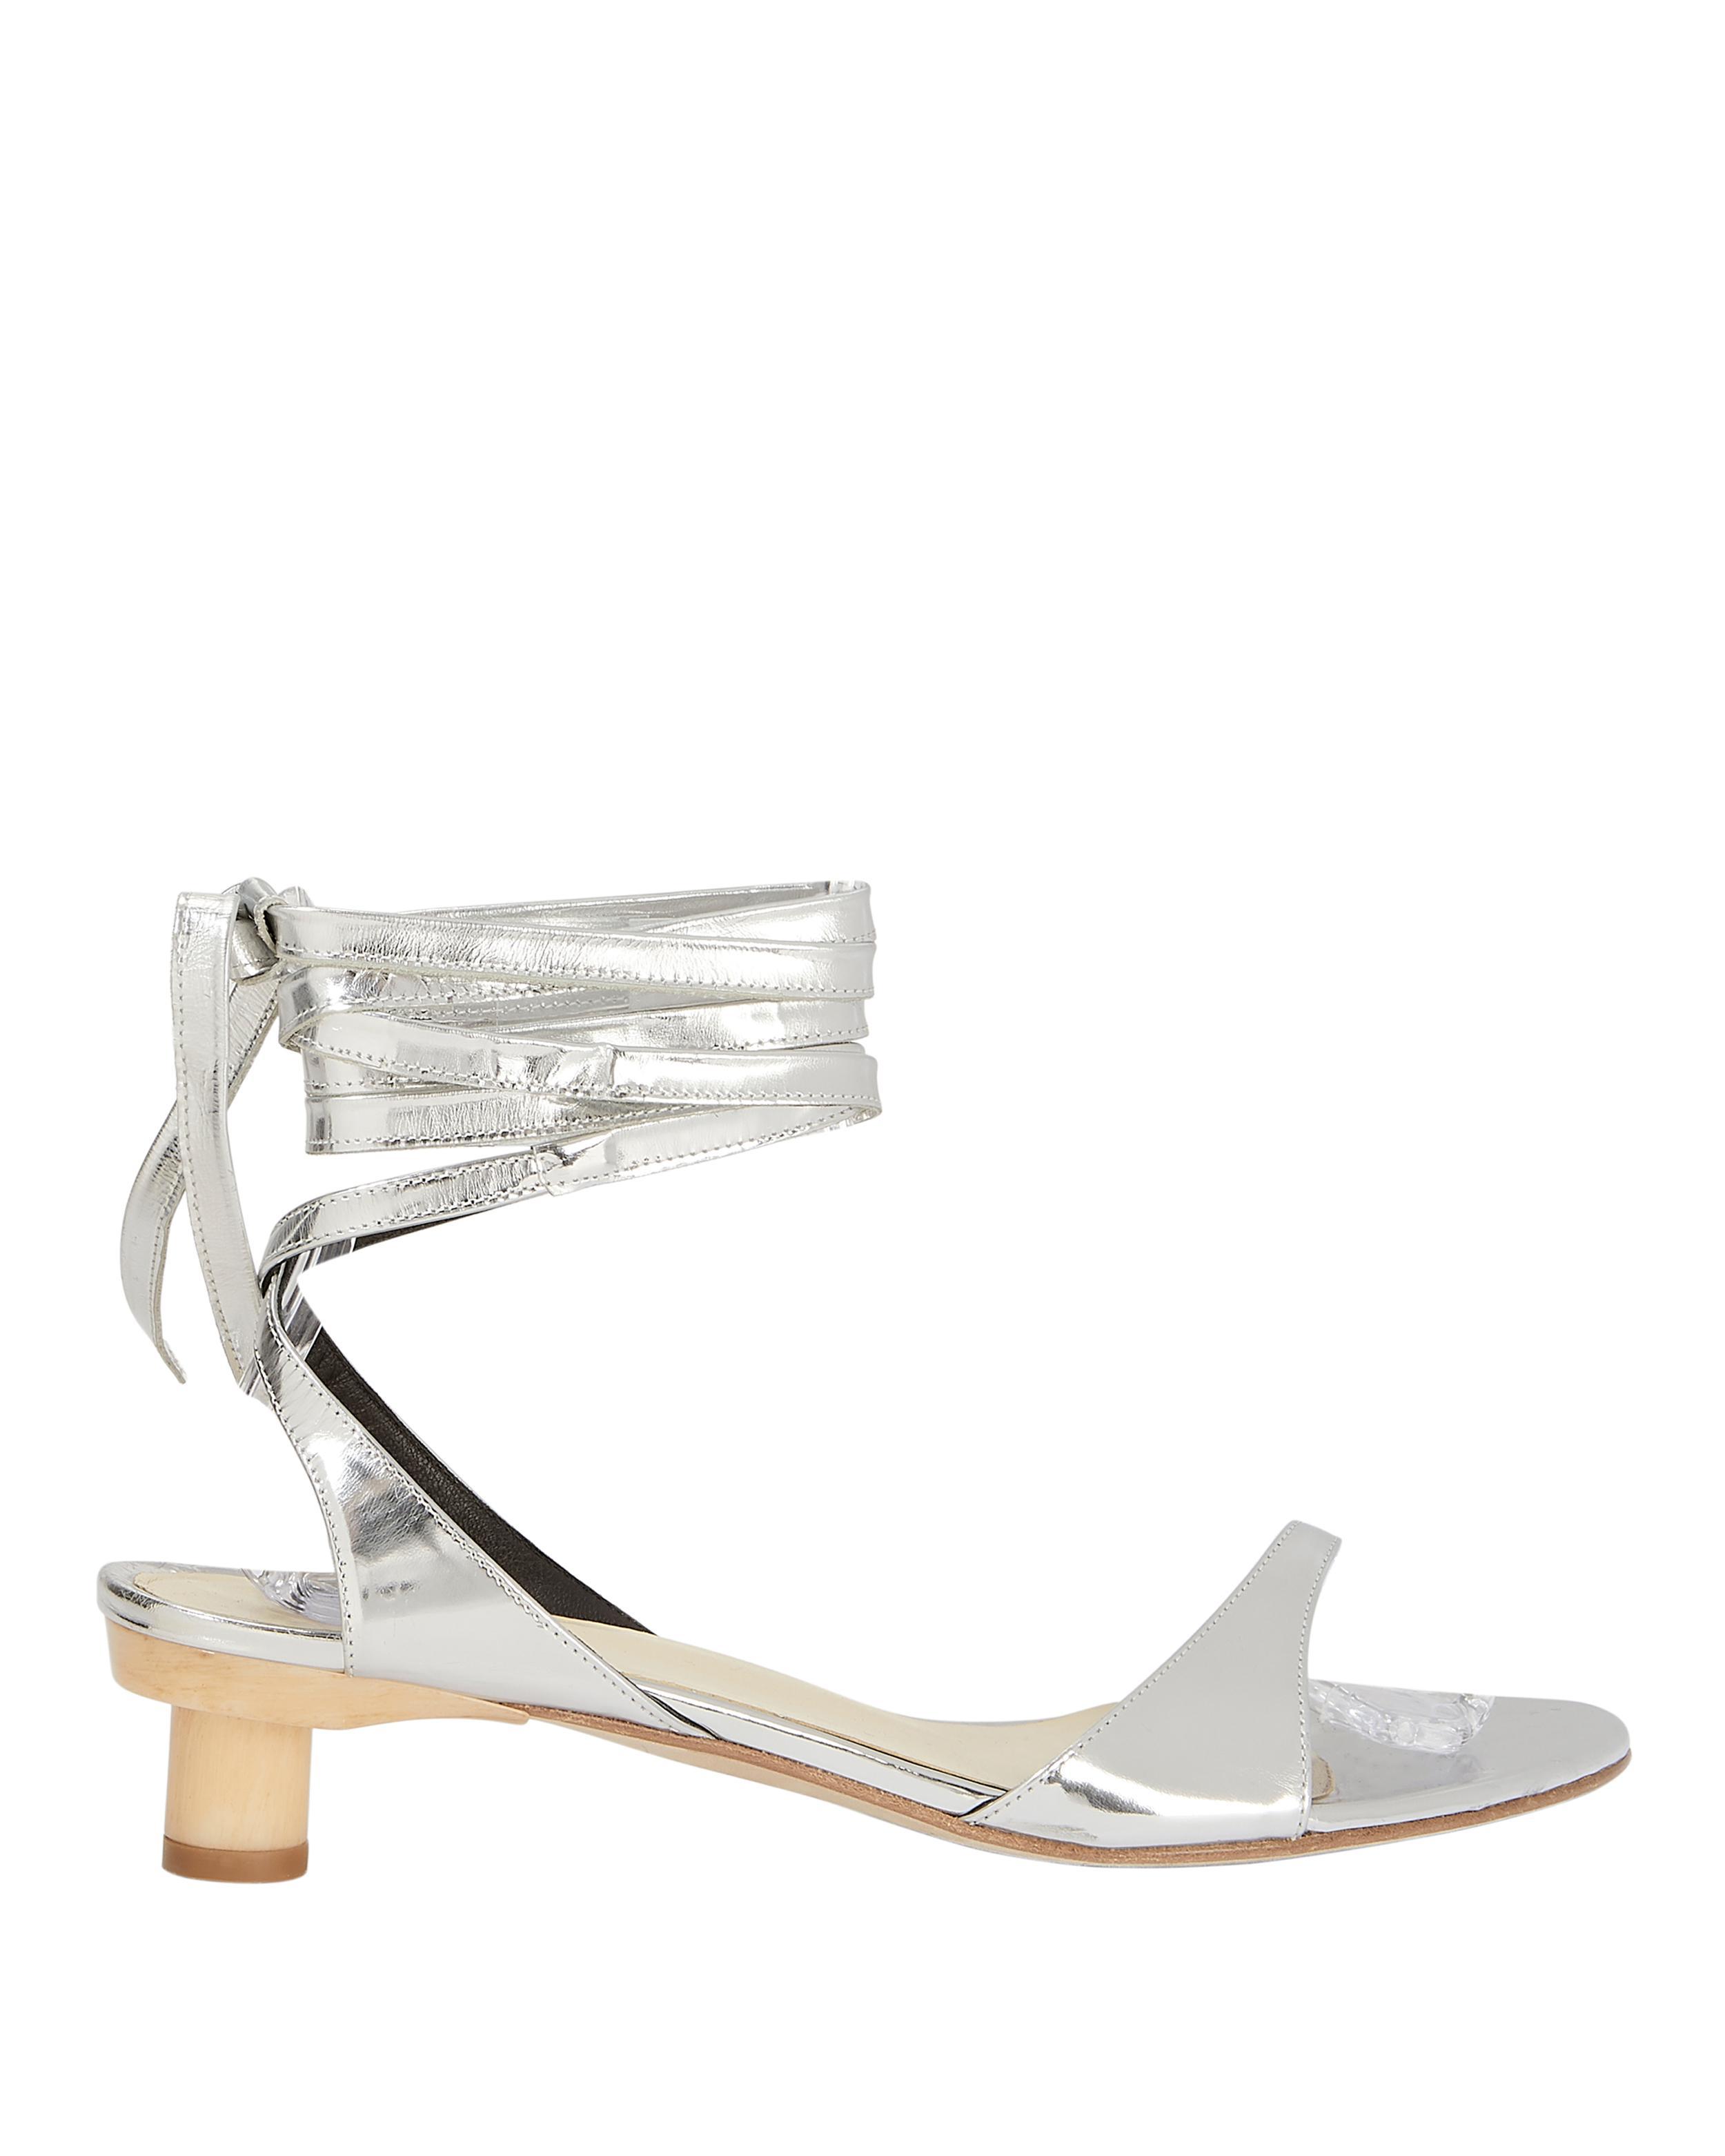 c05ae2eae Lyst - Tibi Scott Metallic Wrap Sandals in Metallic